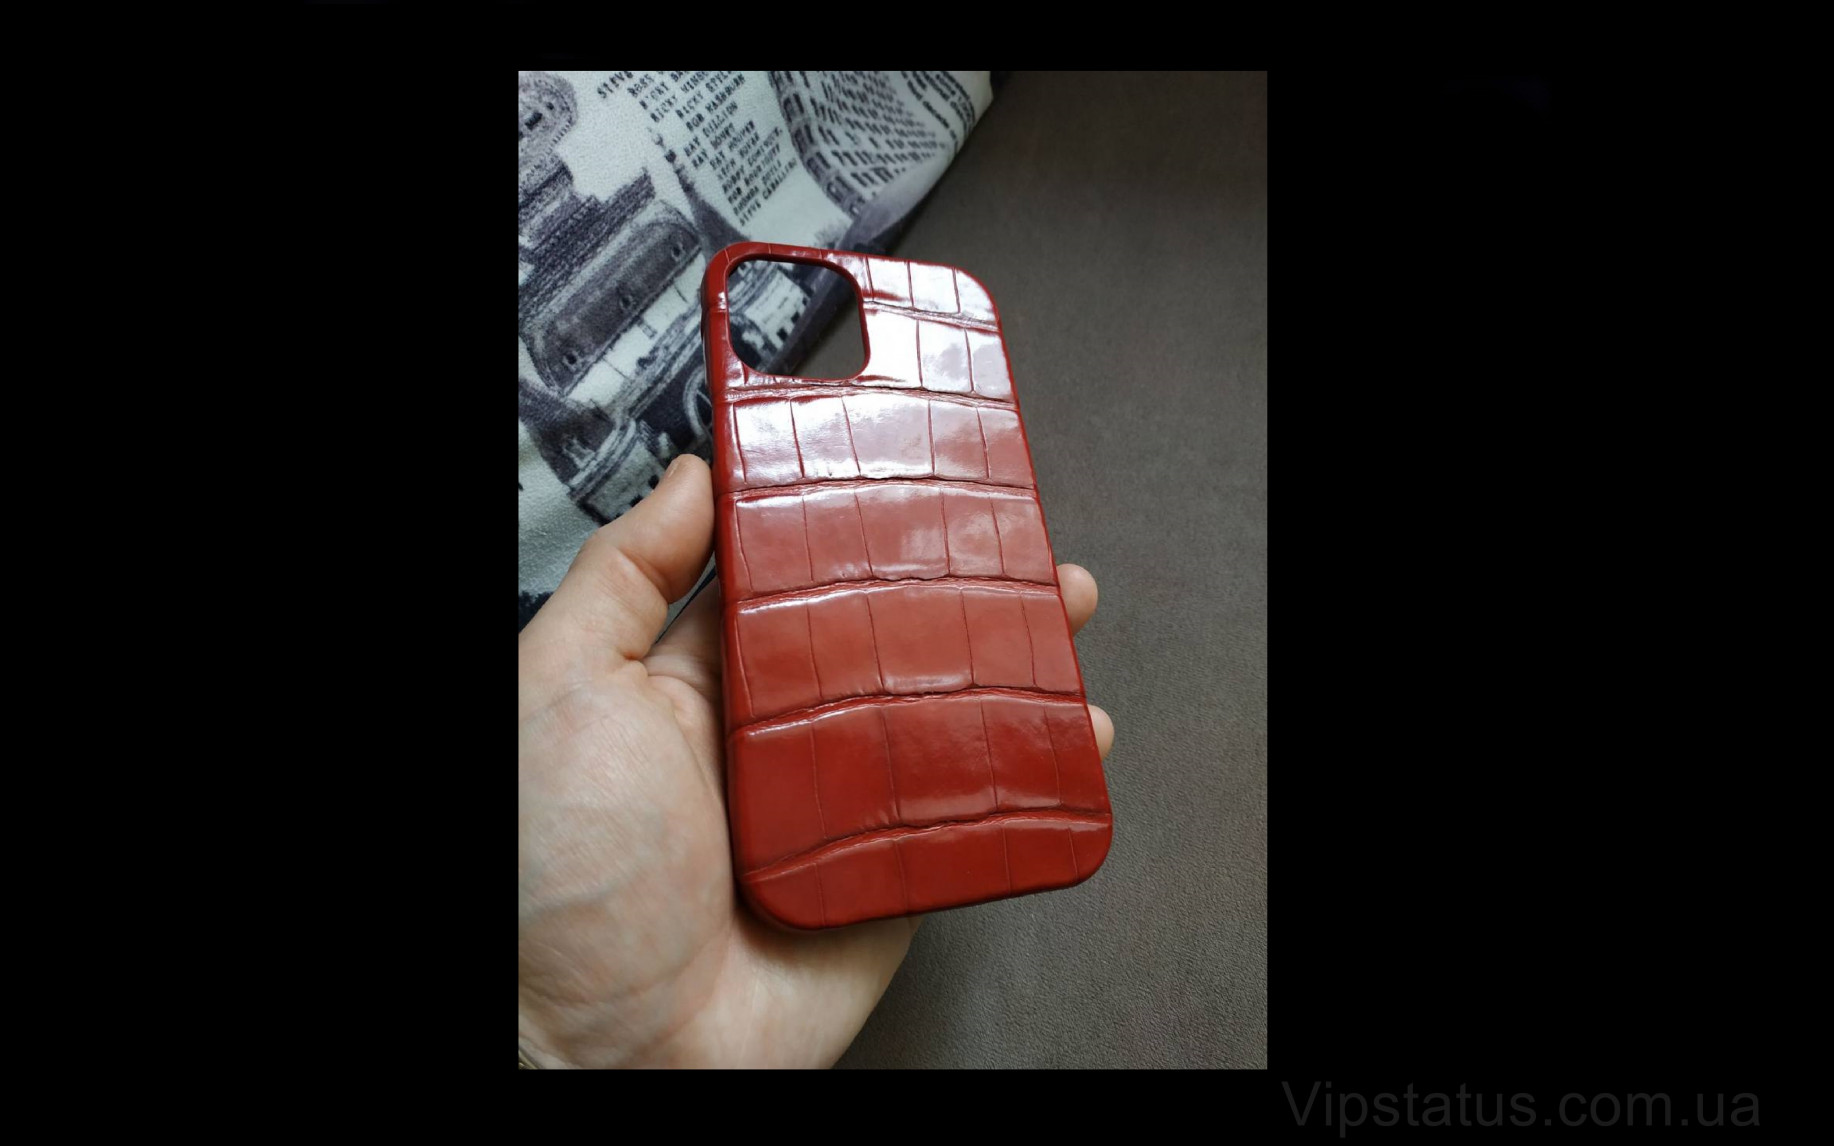 Elite Premium Gloss Люксовый чехол IPhone 11 12 Pro Max Premium Gloss Luxury case IPhone 11 12 Pro Max Crocodile leather image 1